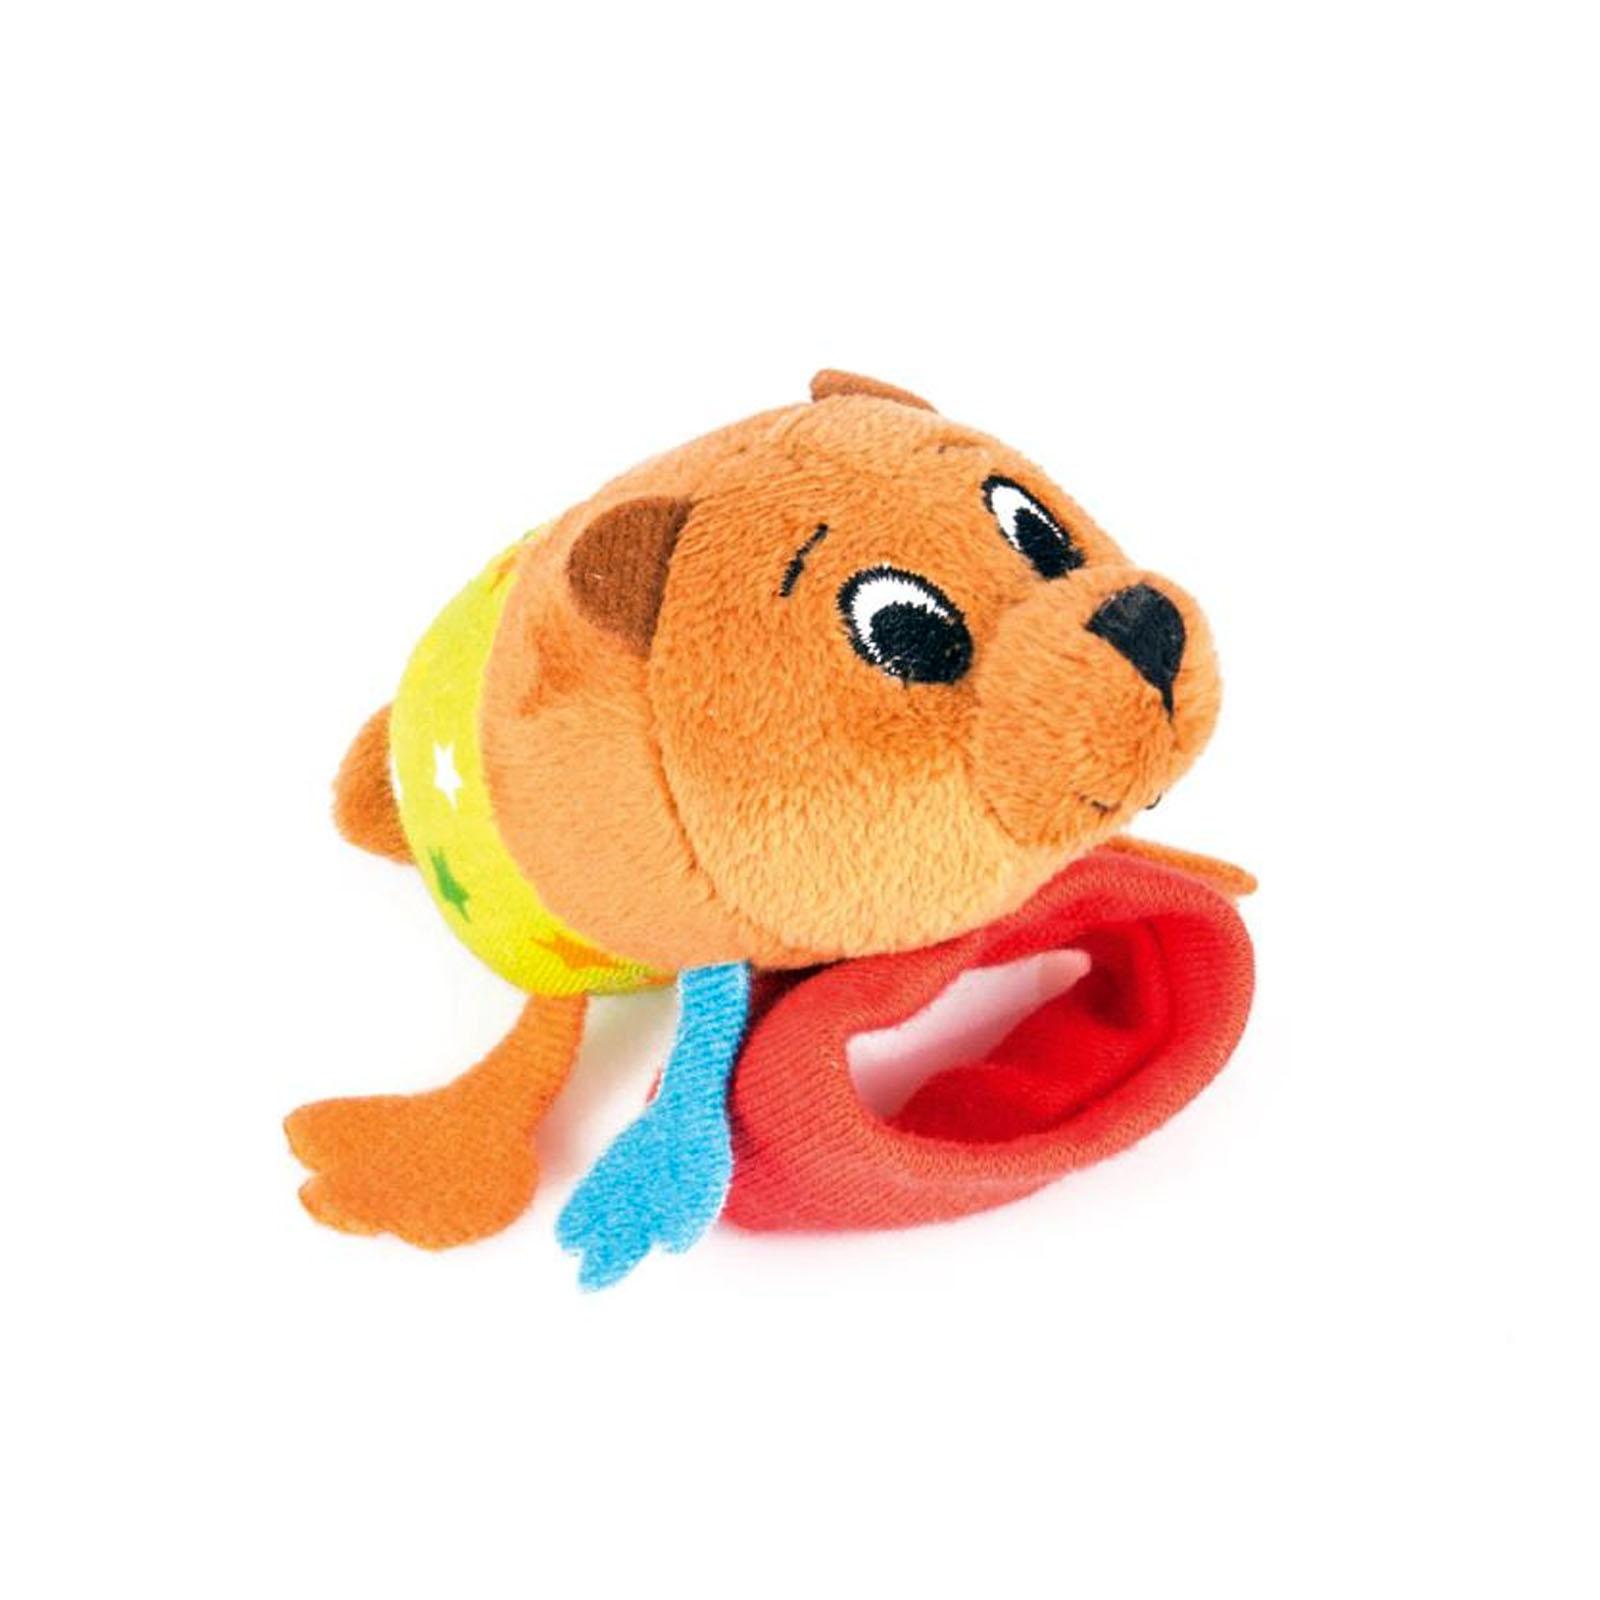 Погремушка на ручку медвежонок берни Happy snail 14HSB01BE happy baby 330058 игрушка погремушка keys of fun